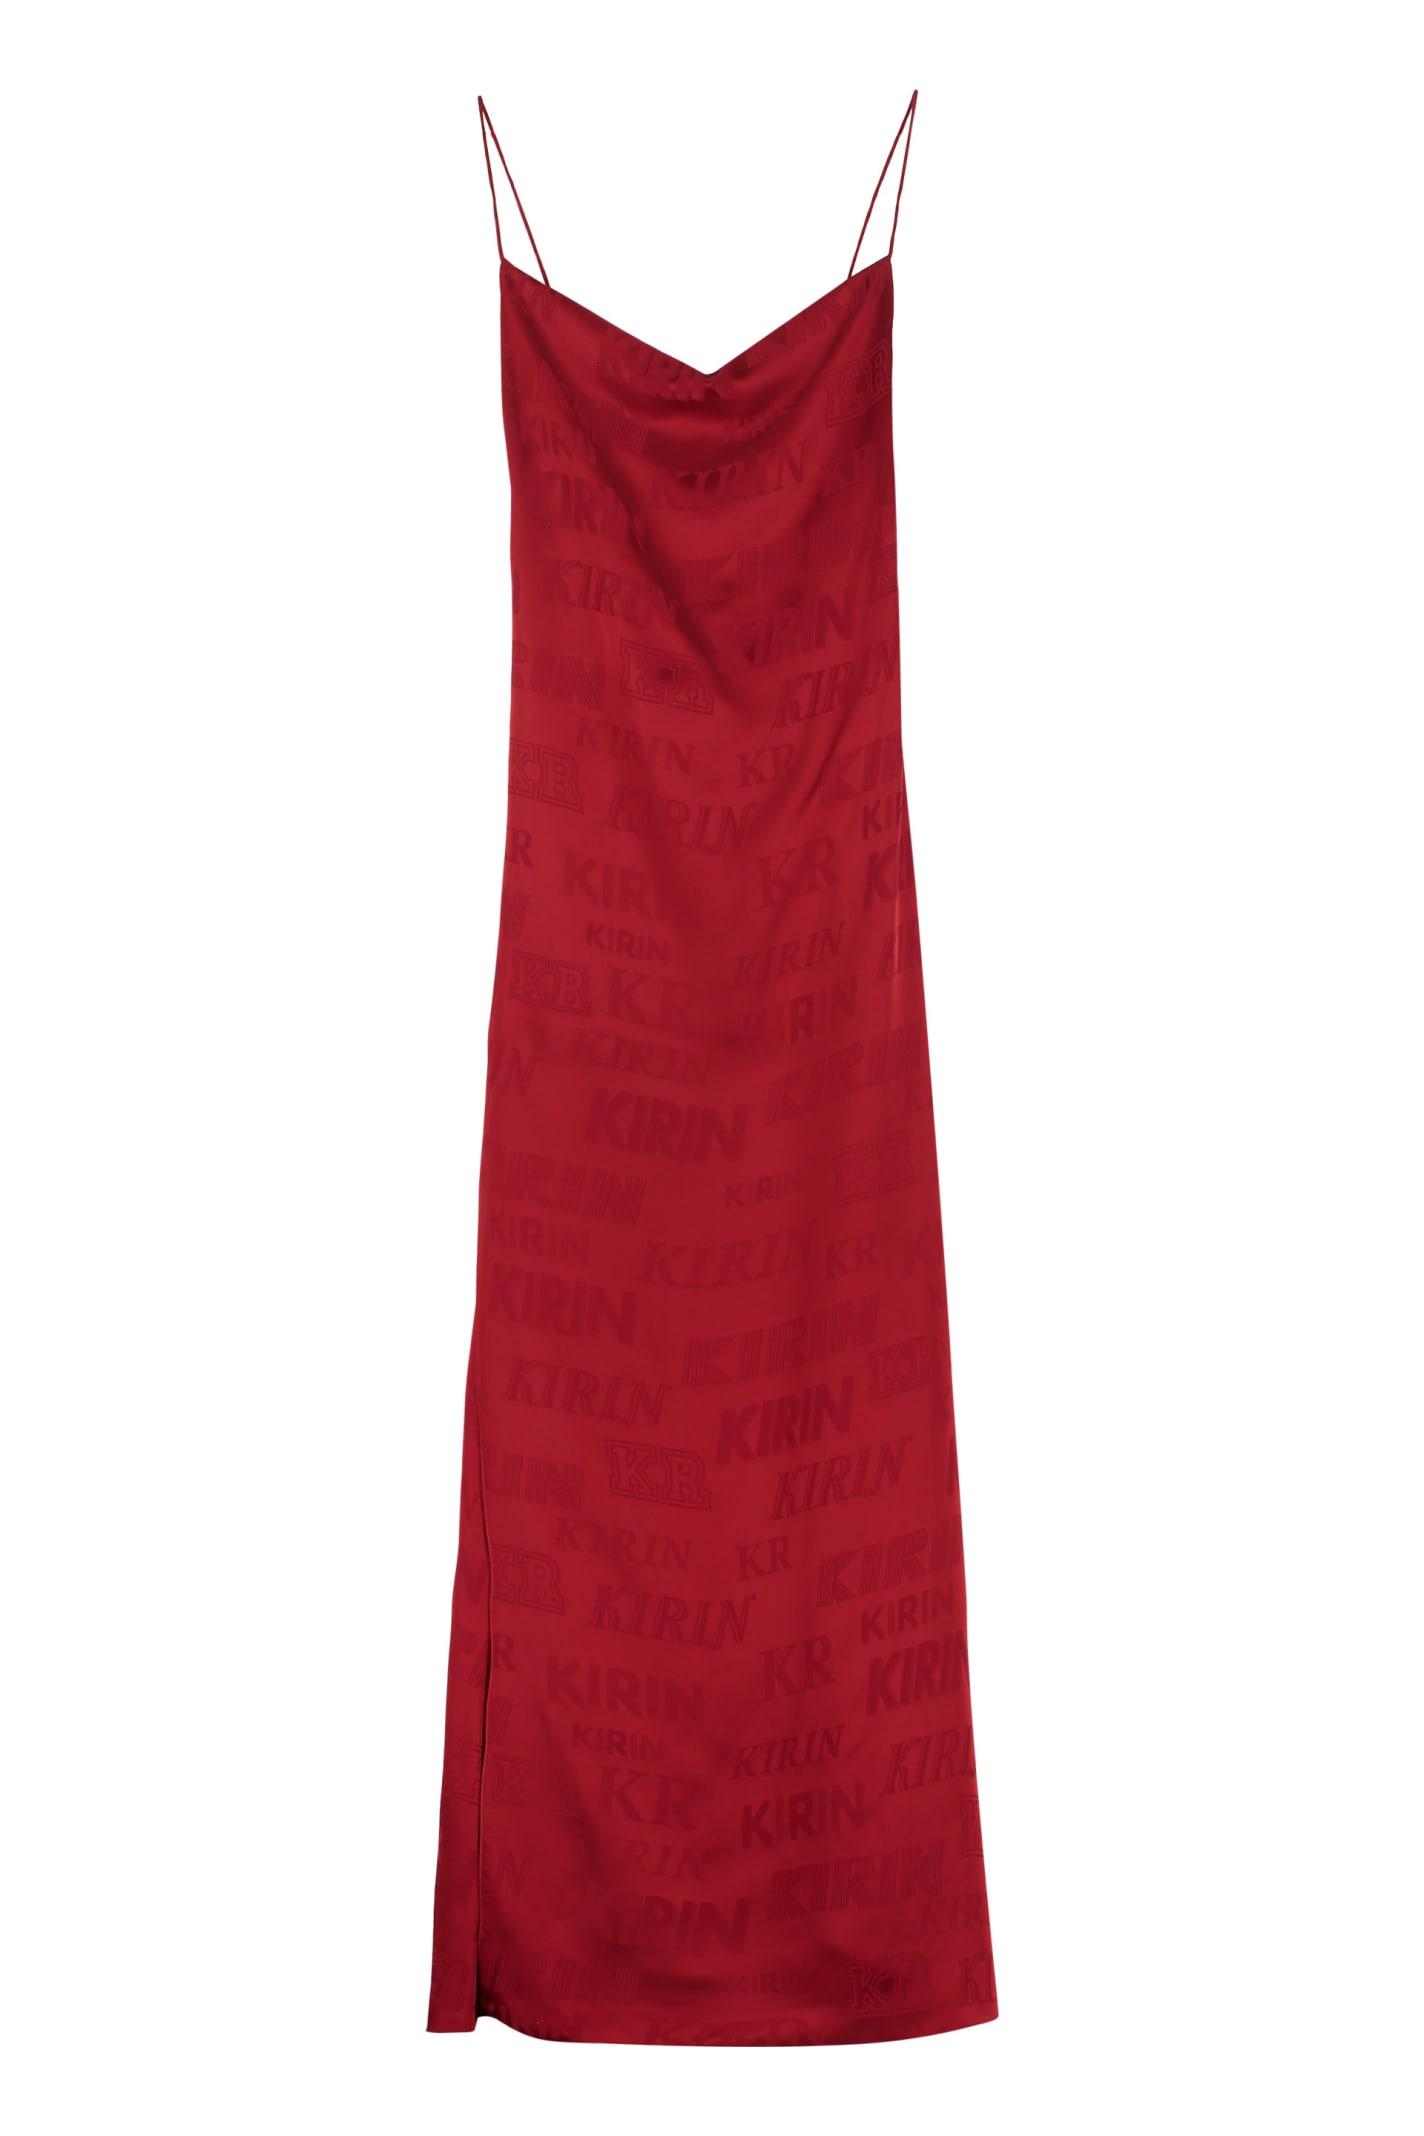 Buy Kirin Jacquard Dress online, shop Kirin with free shipping